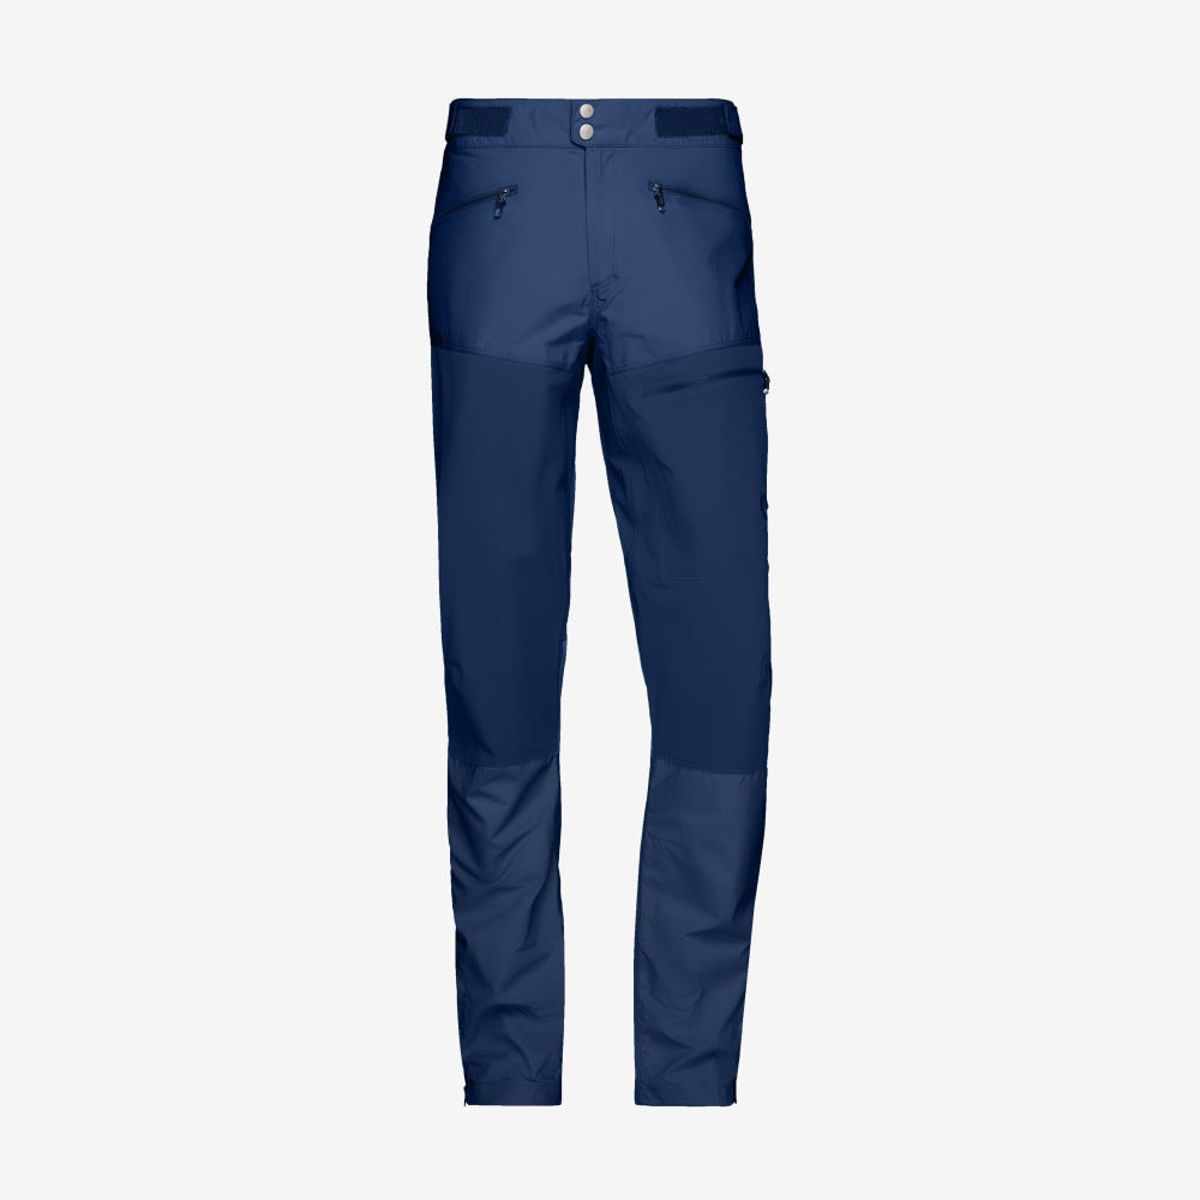 Bilde av bitihorn lightweight Pants (M)